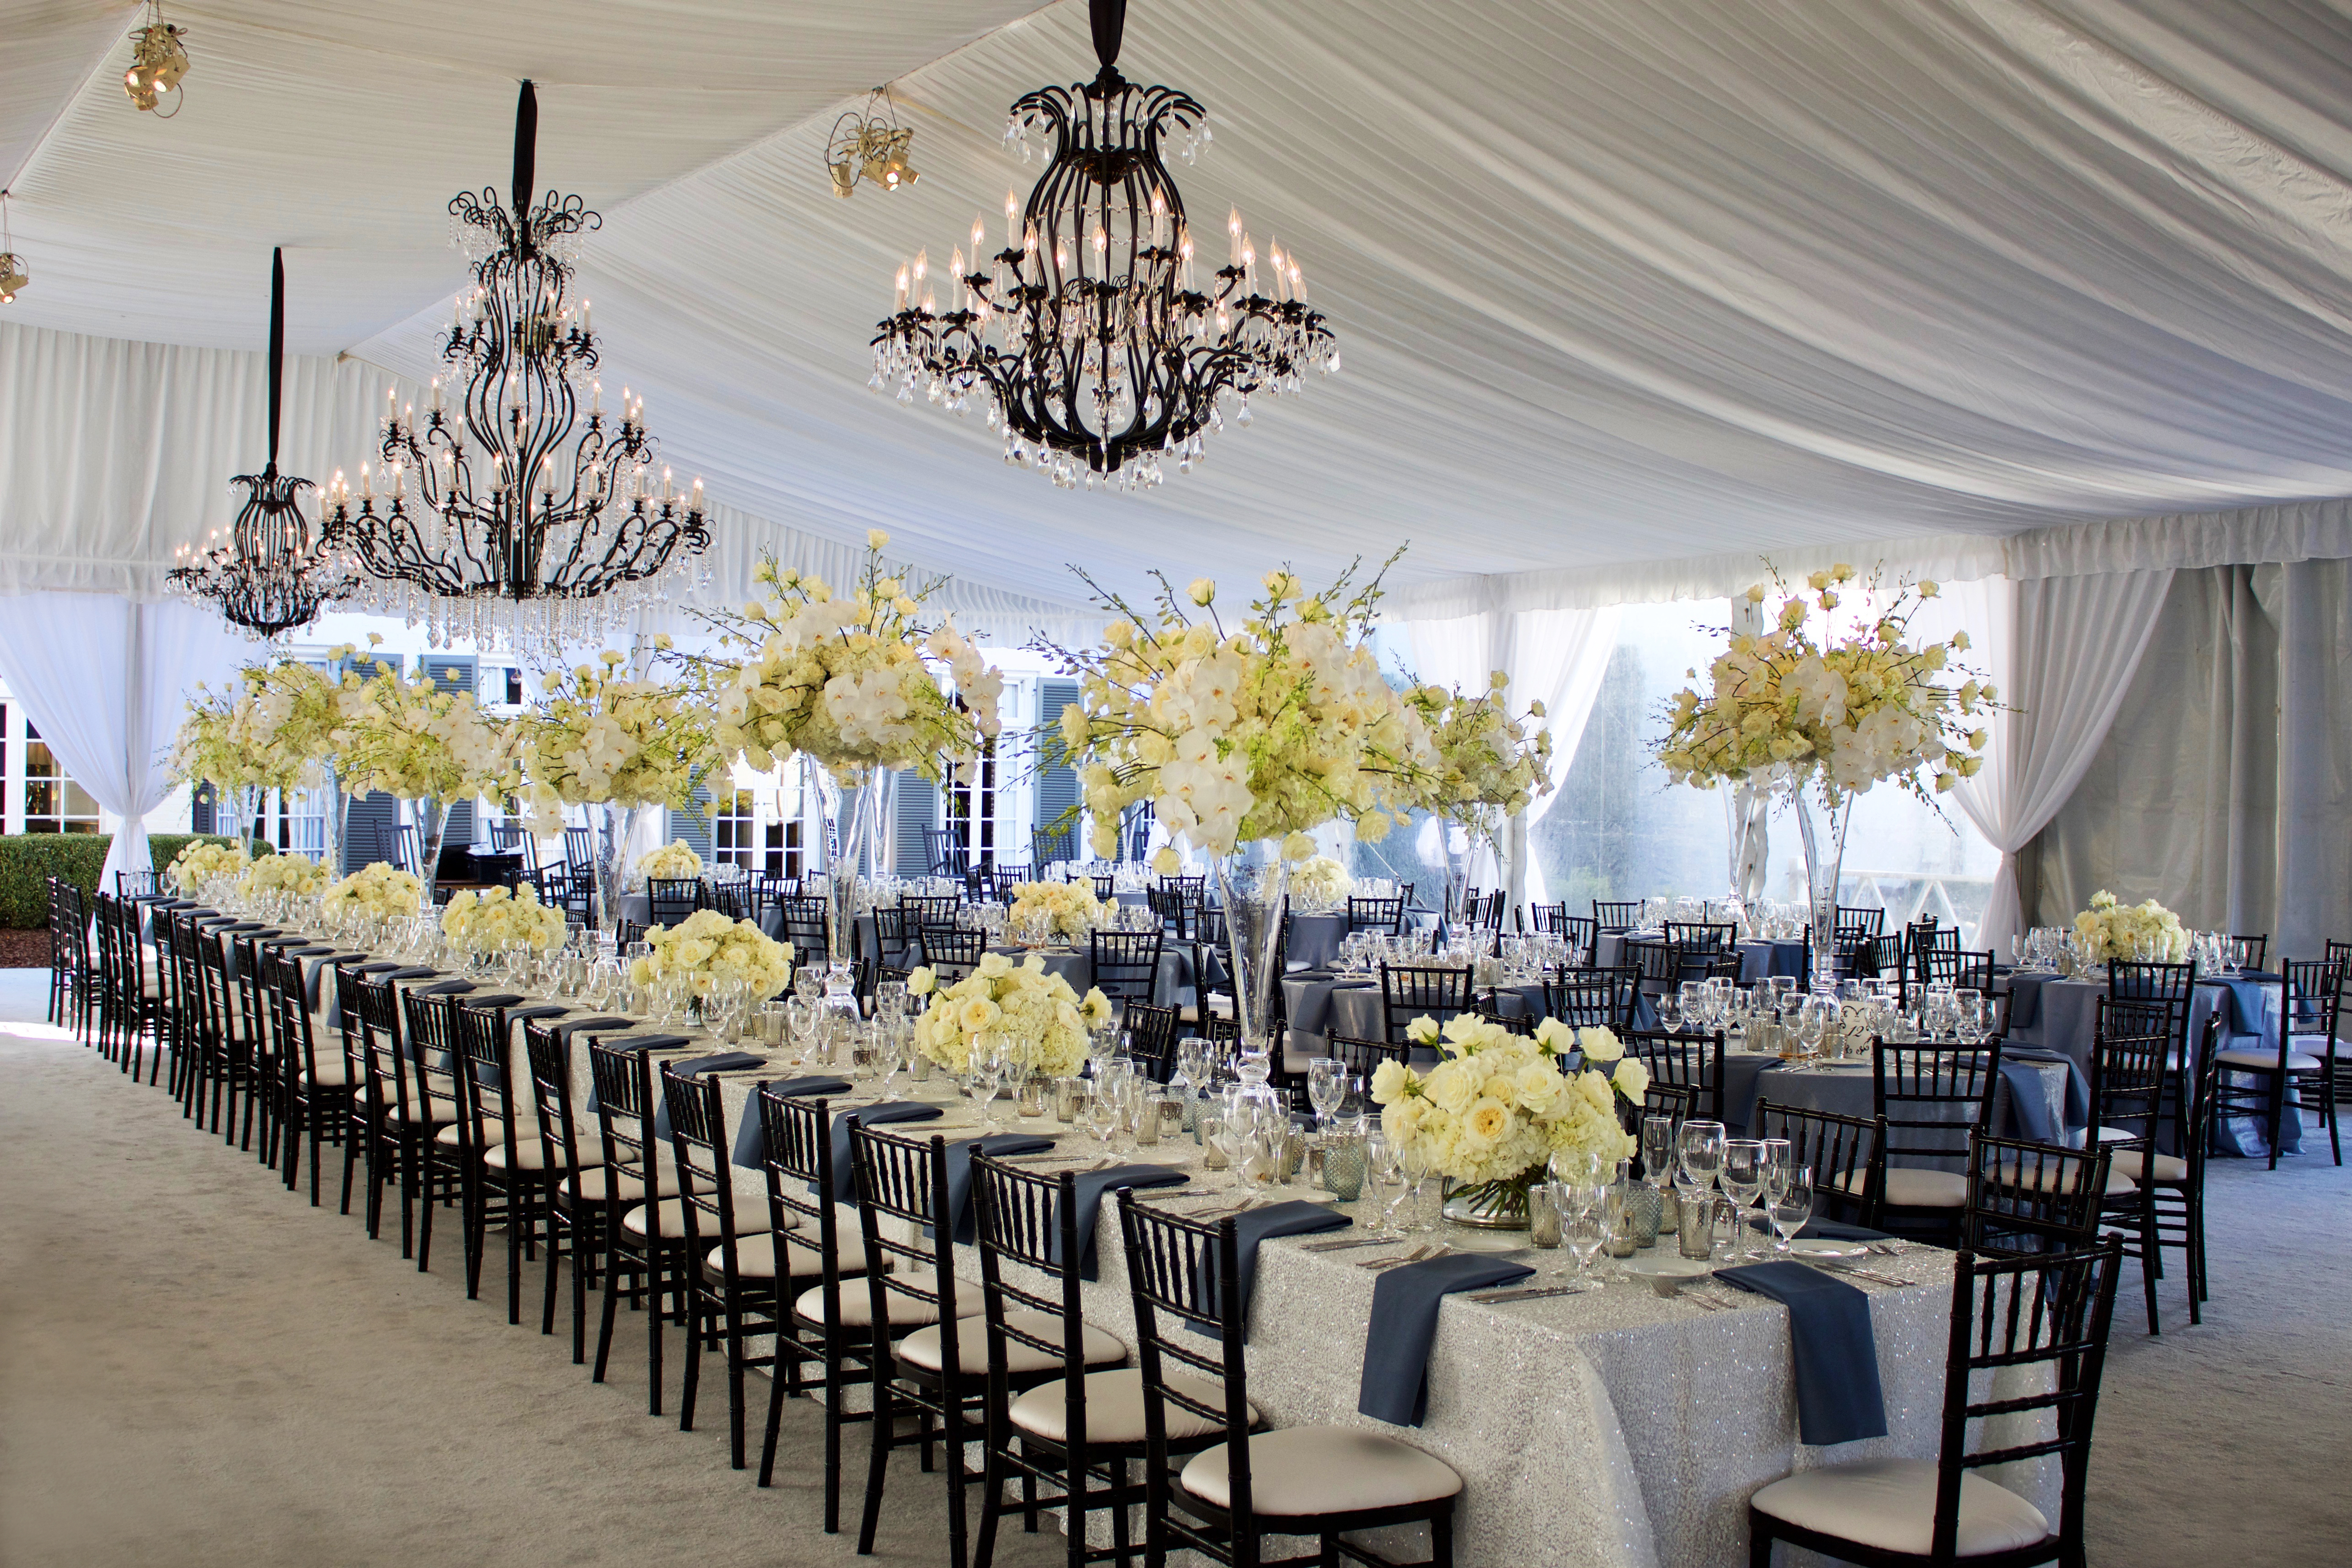 Stunning White & Black Tented Wedding - Dina Berg Blazek Events